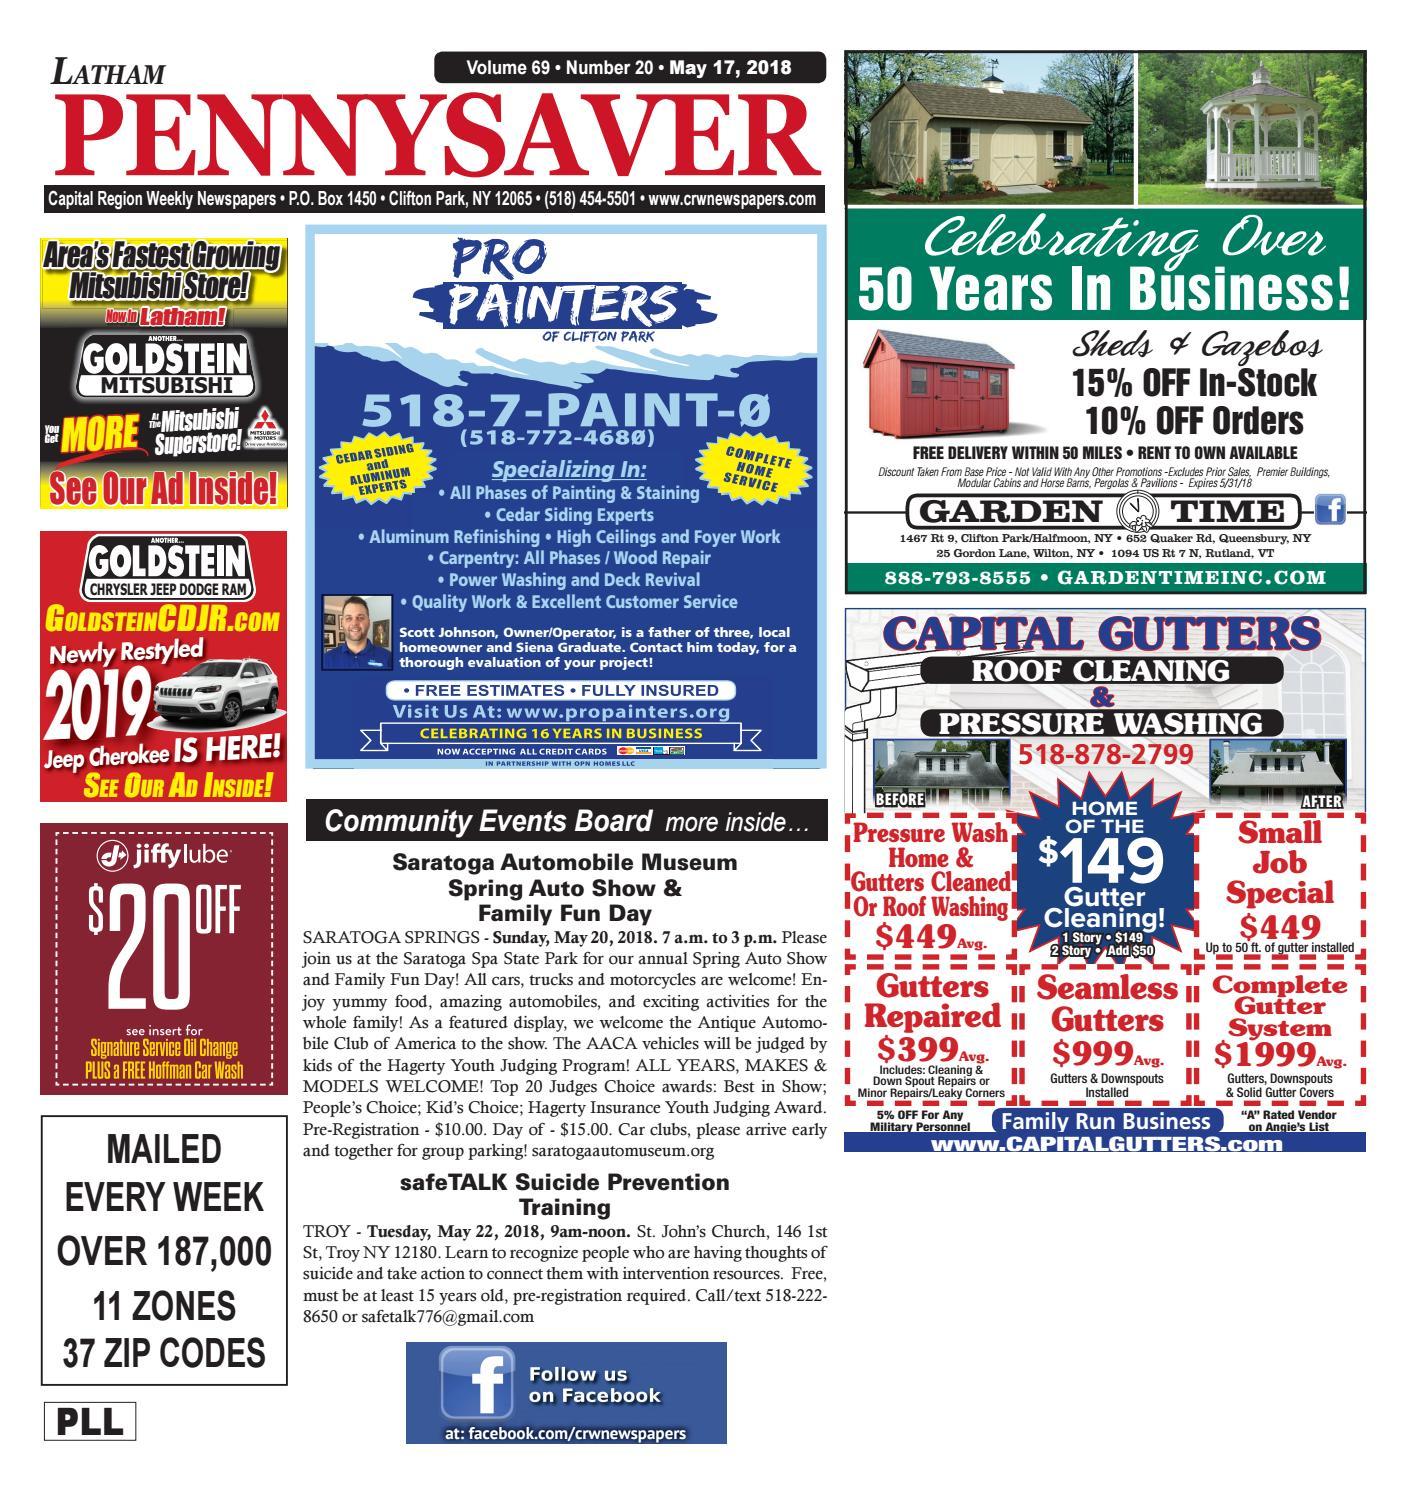 66ad297b8cafe2 Latham Pennysaver 051718 by Capital Region Weekly Newspapers - issuu